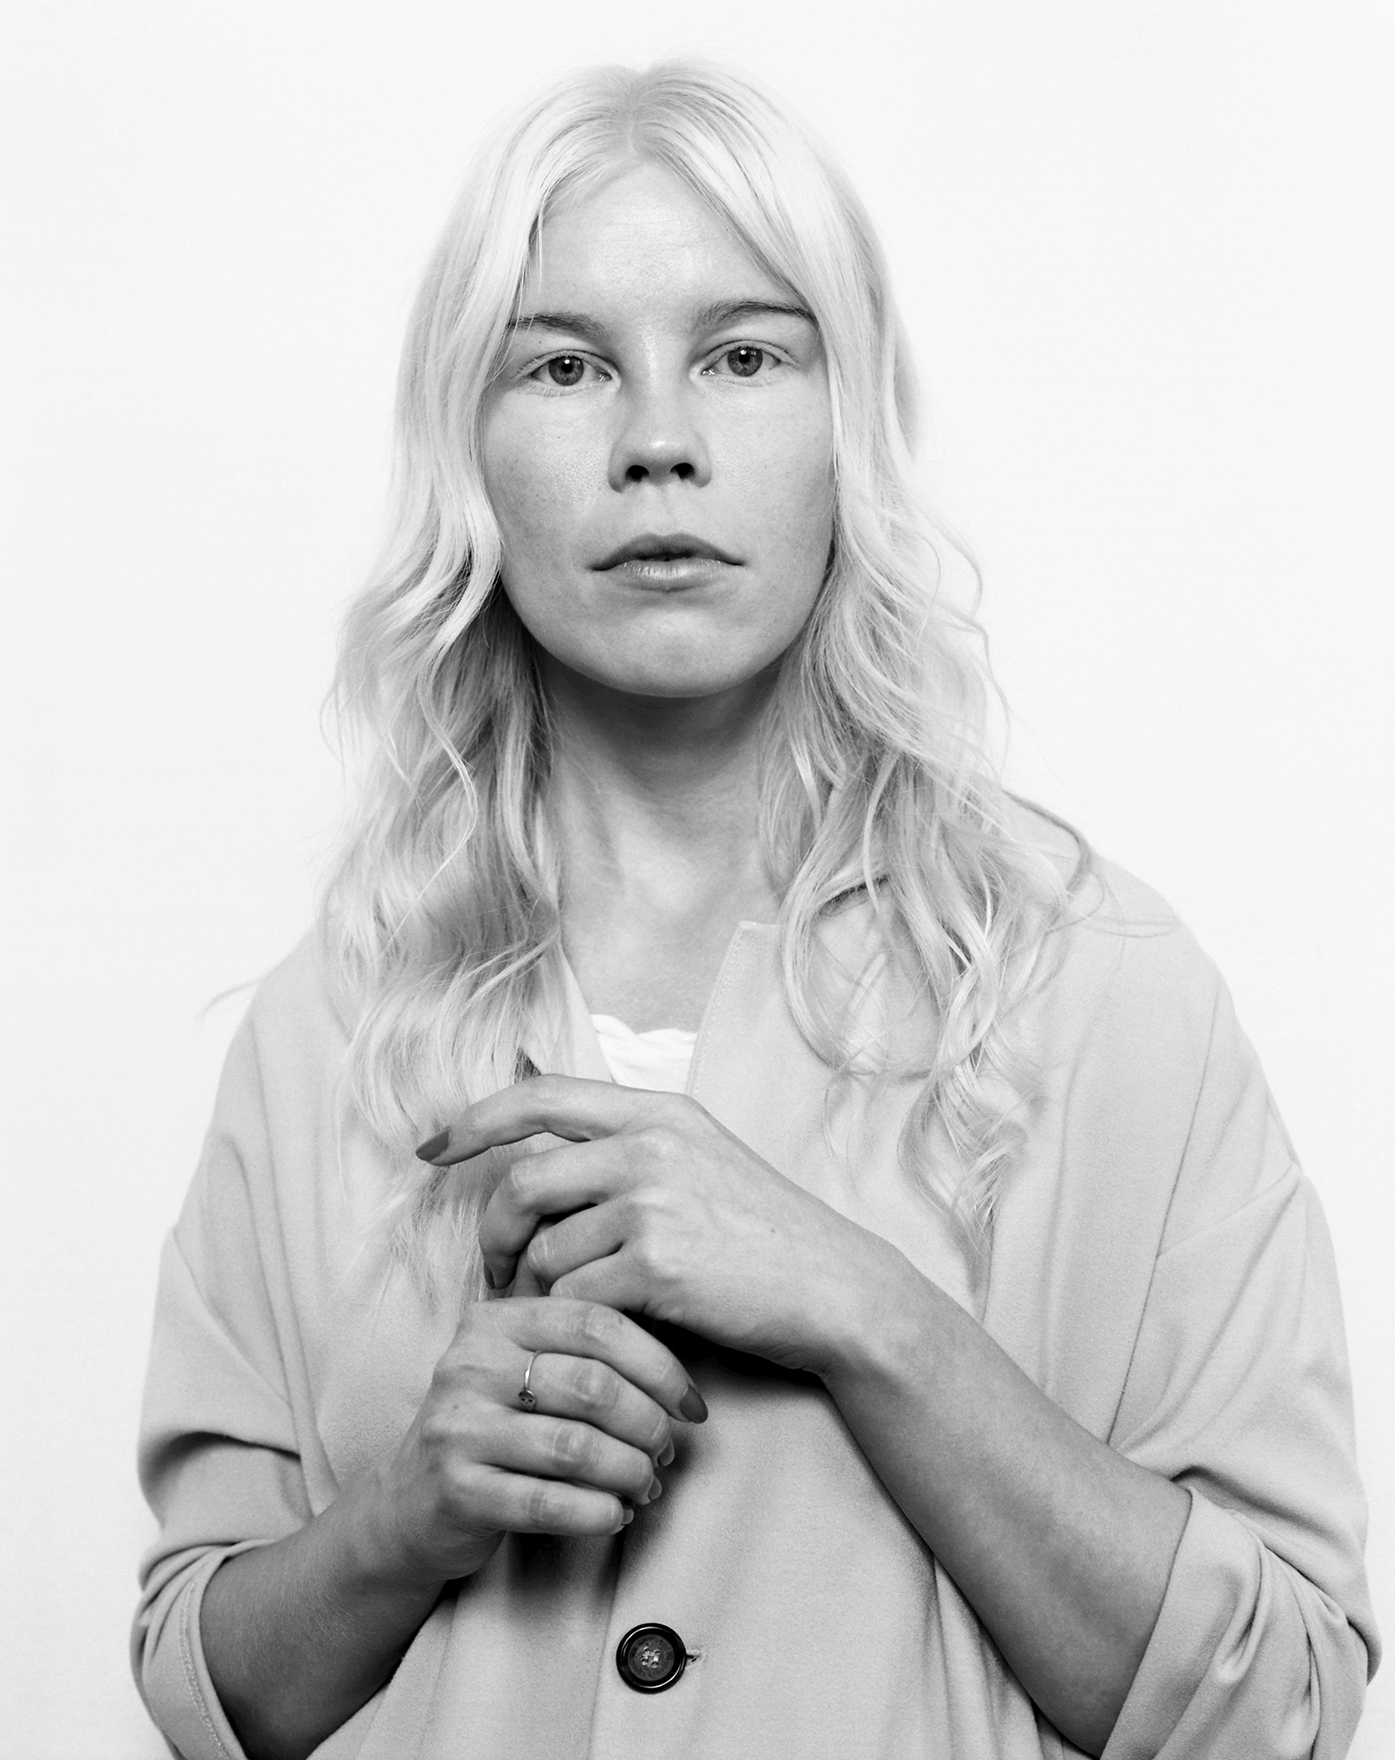 Simone Ejstrupp, writer Denmark, shot in NYC 2015